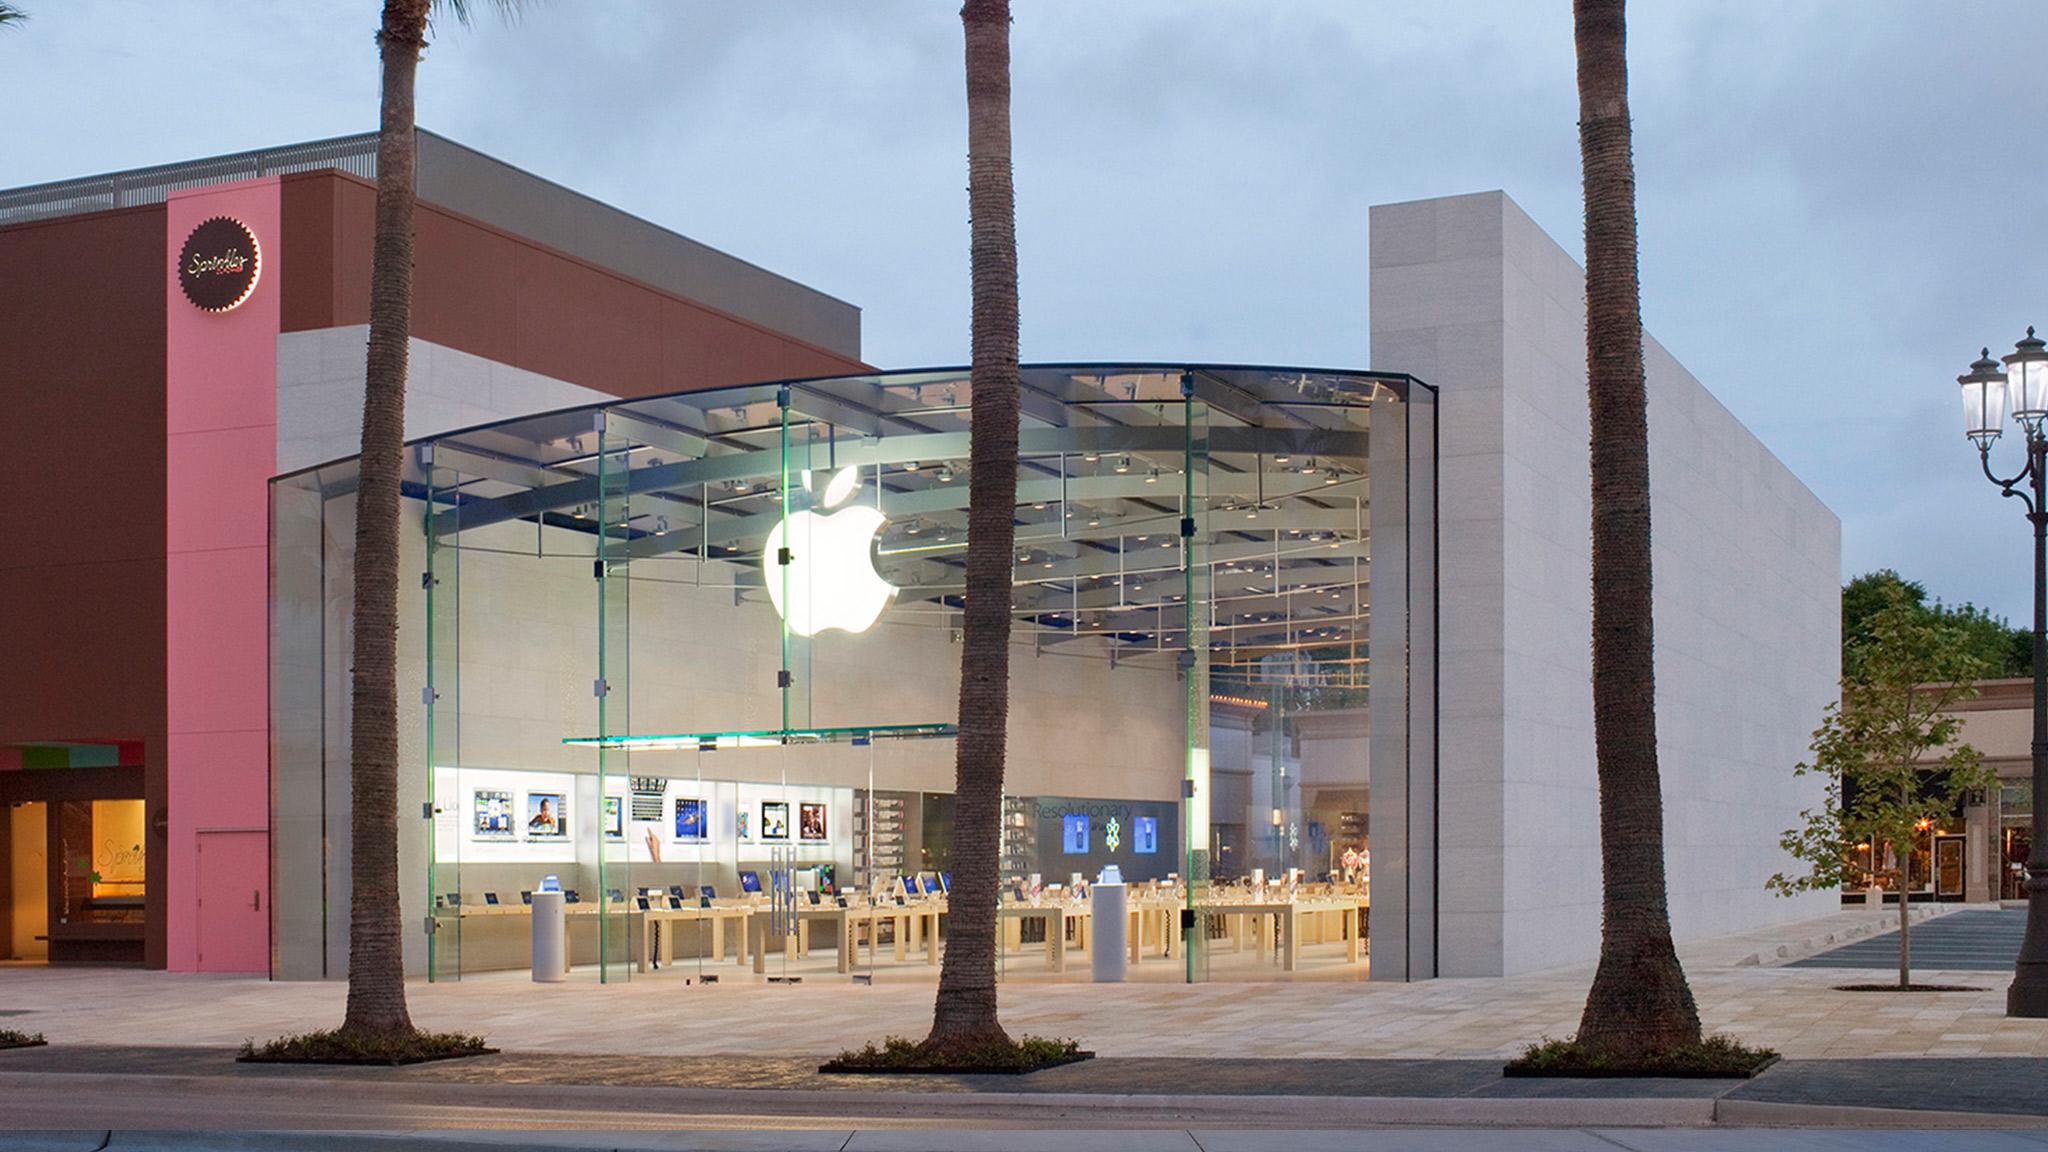 Electronics Store in TX Houston 77027 Apple Highland Village 4012 Westheimer Road  (832)325-3500